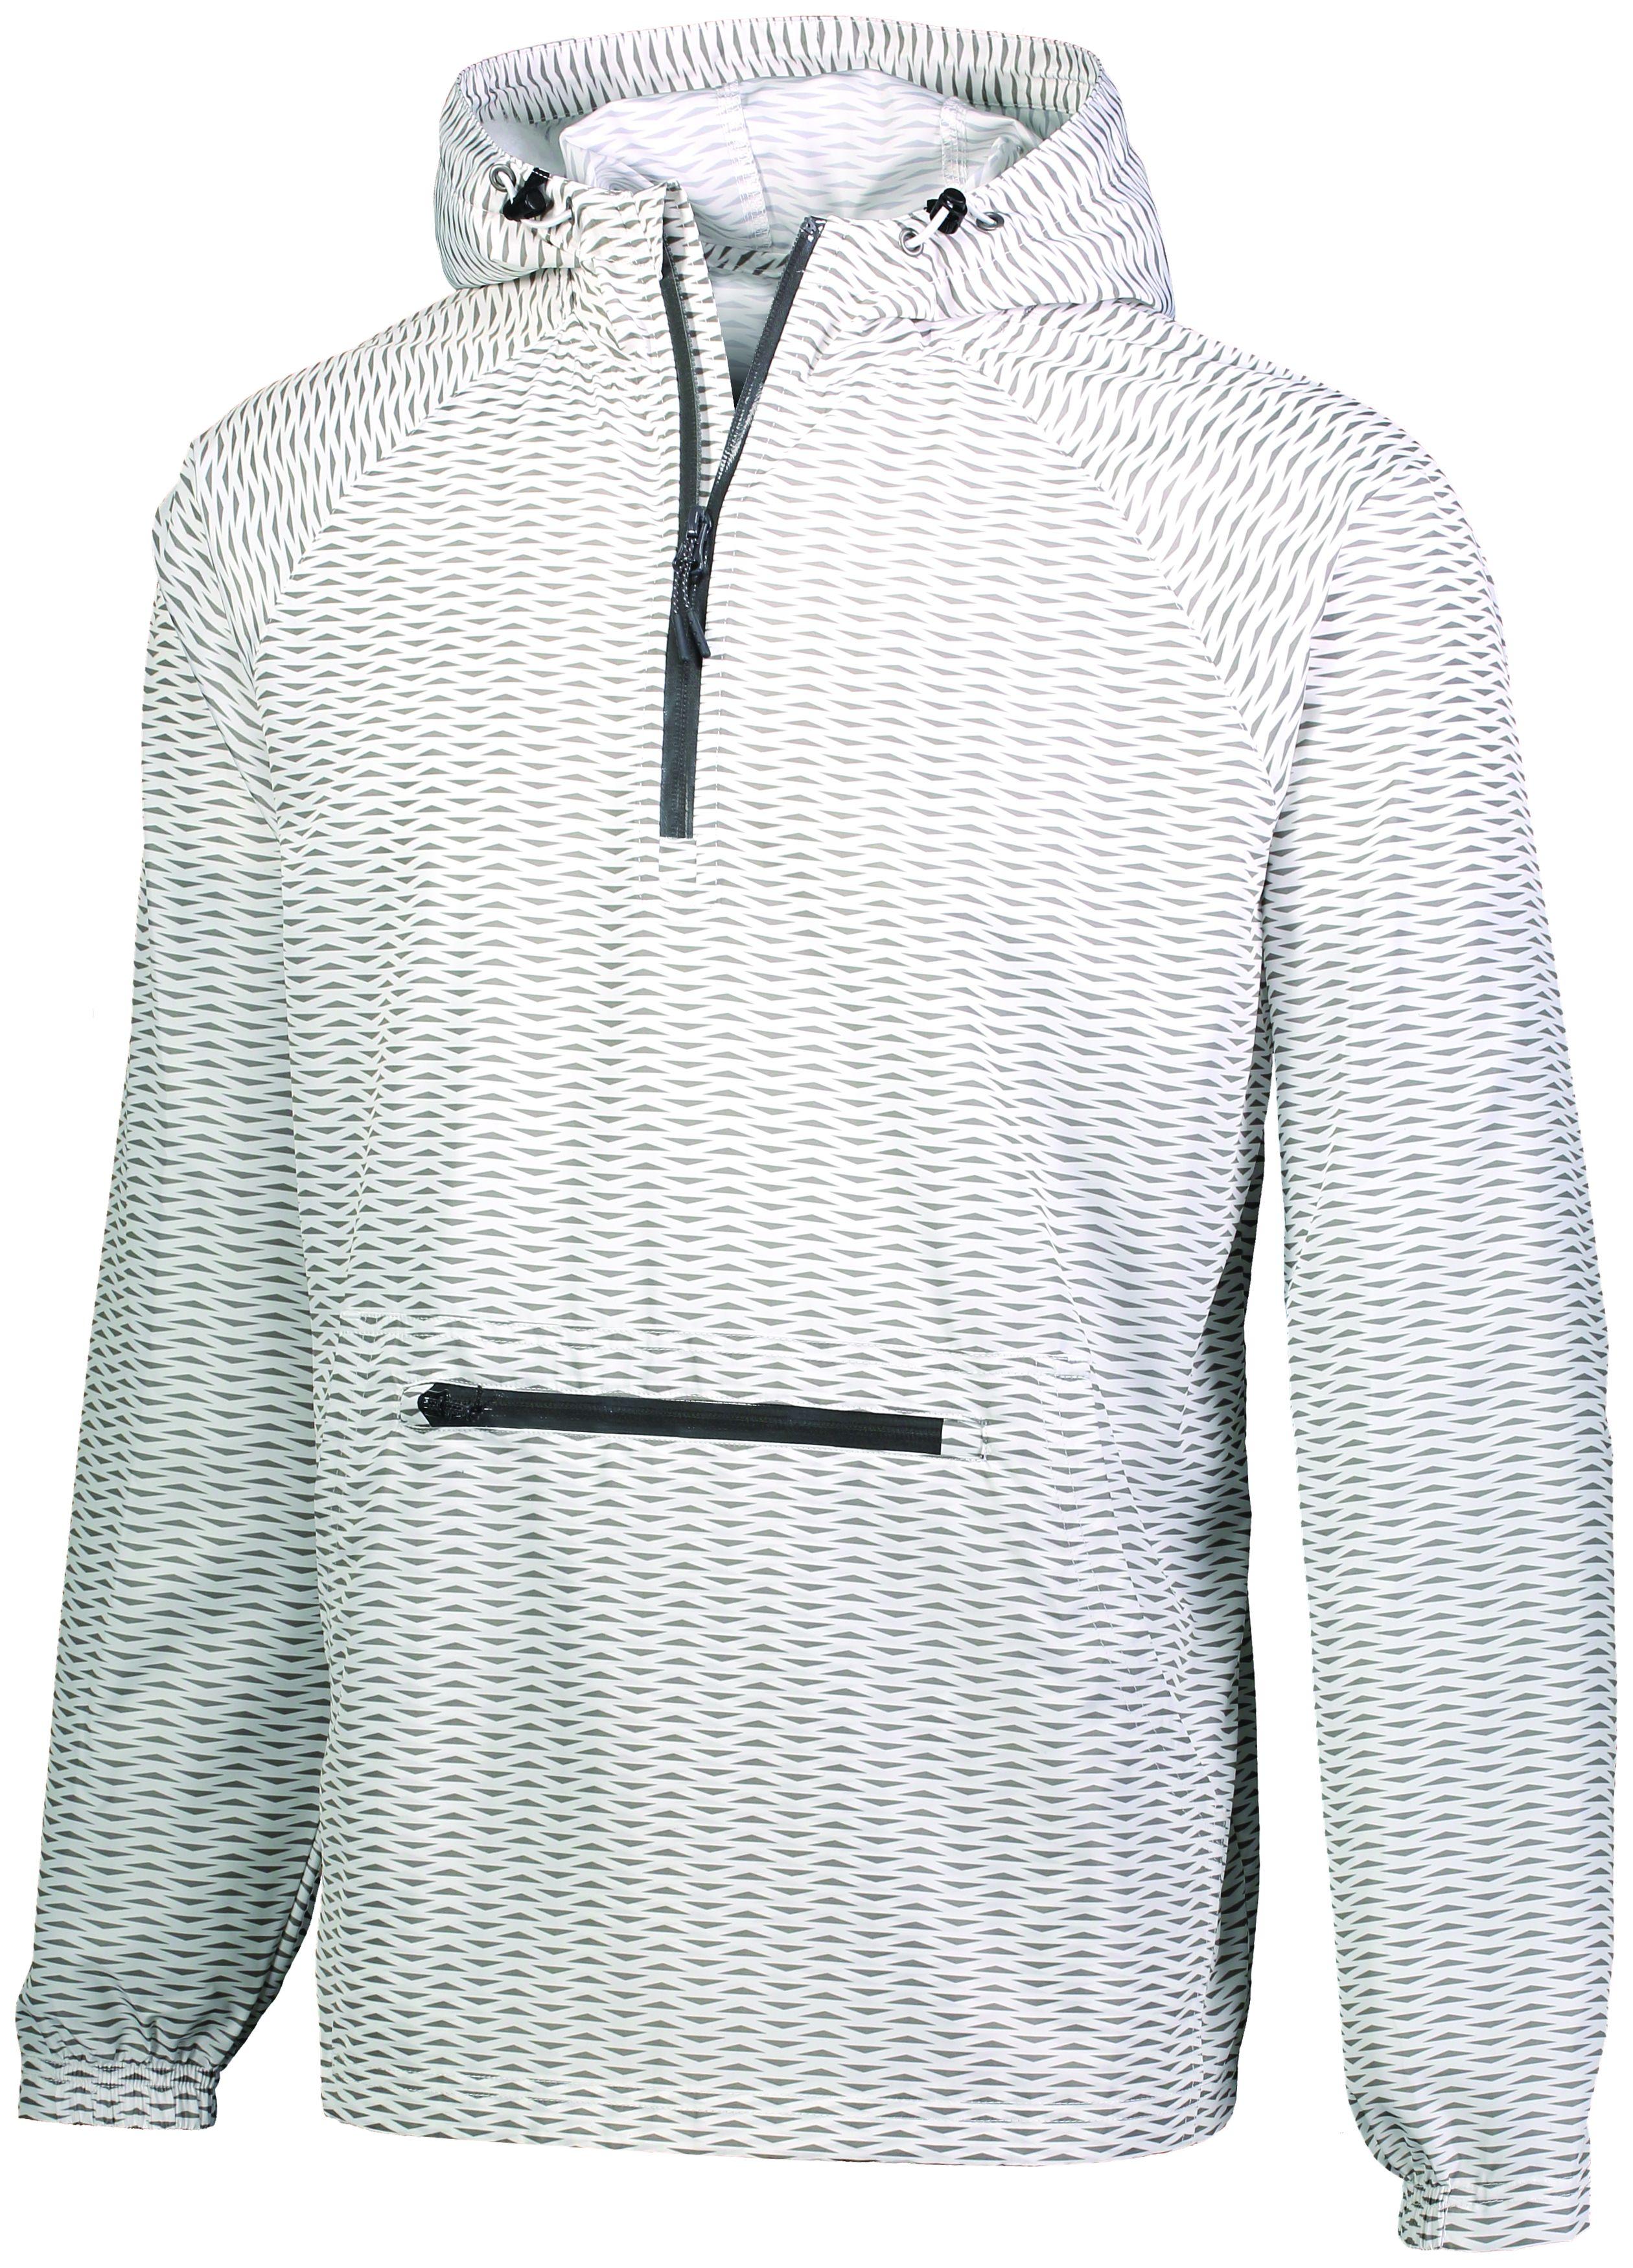 Range Packable Pullover - WHITE